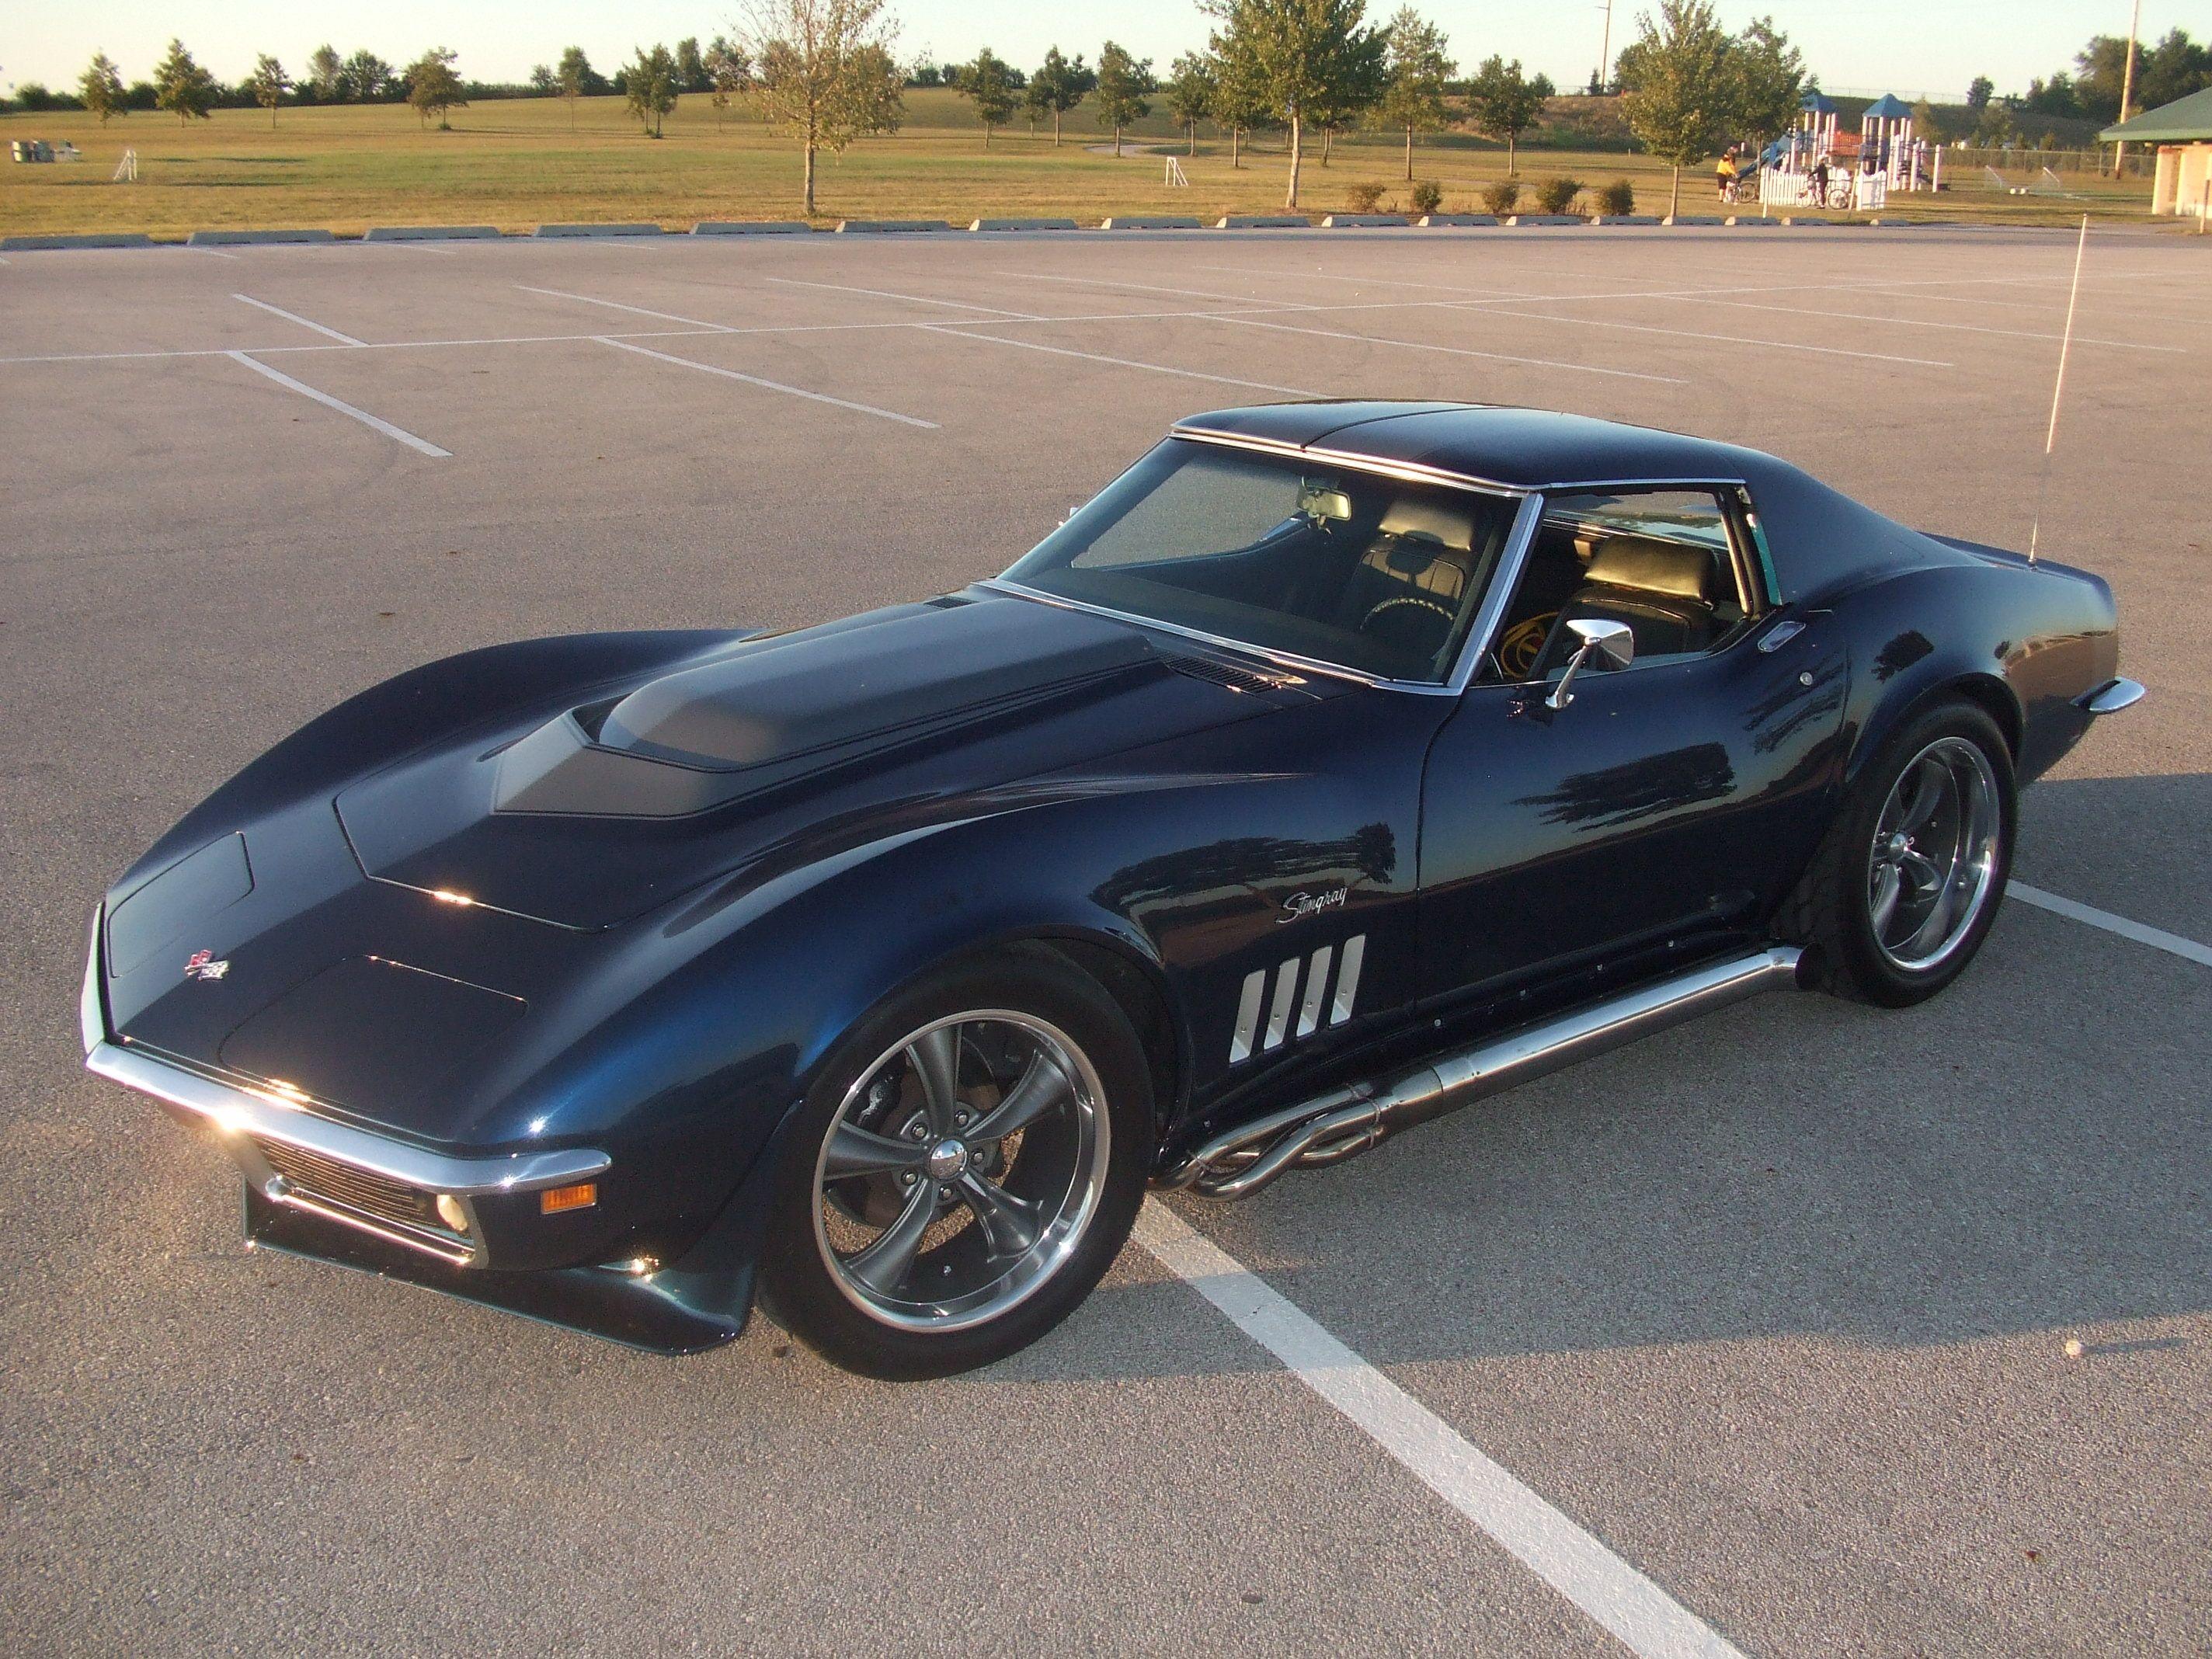 stingray corvette corvette c3 stingrays sweet cars hot cars dream cars. Cars Review. Best American Auto & Cars Review